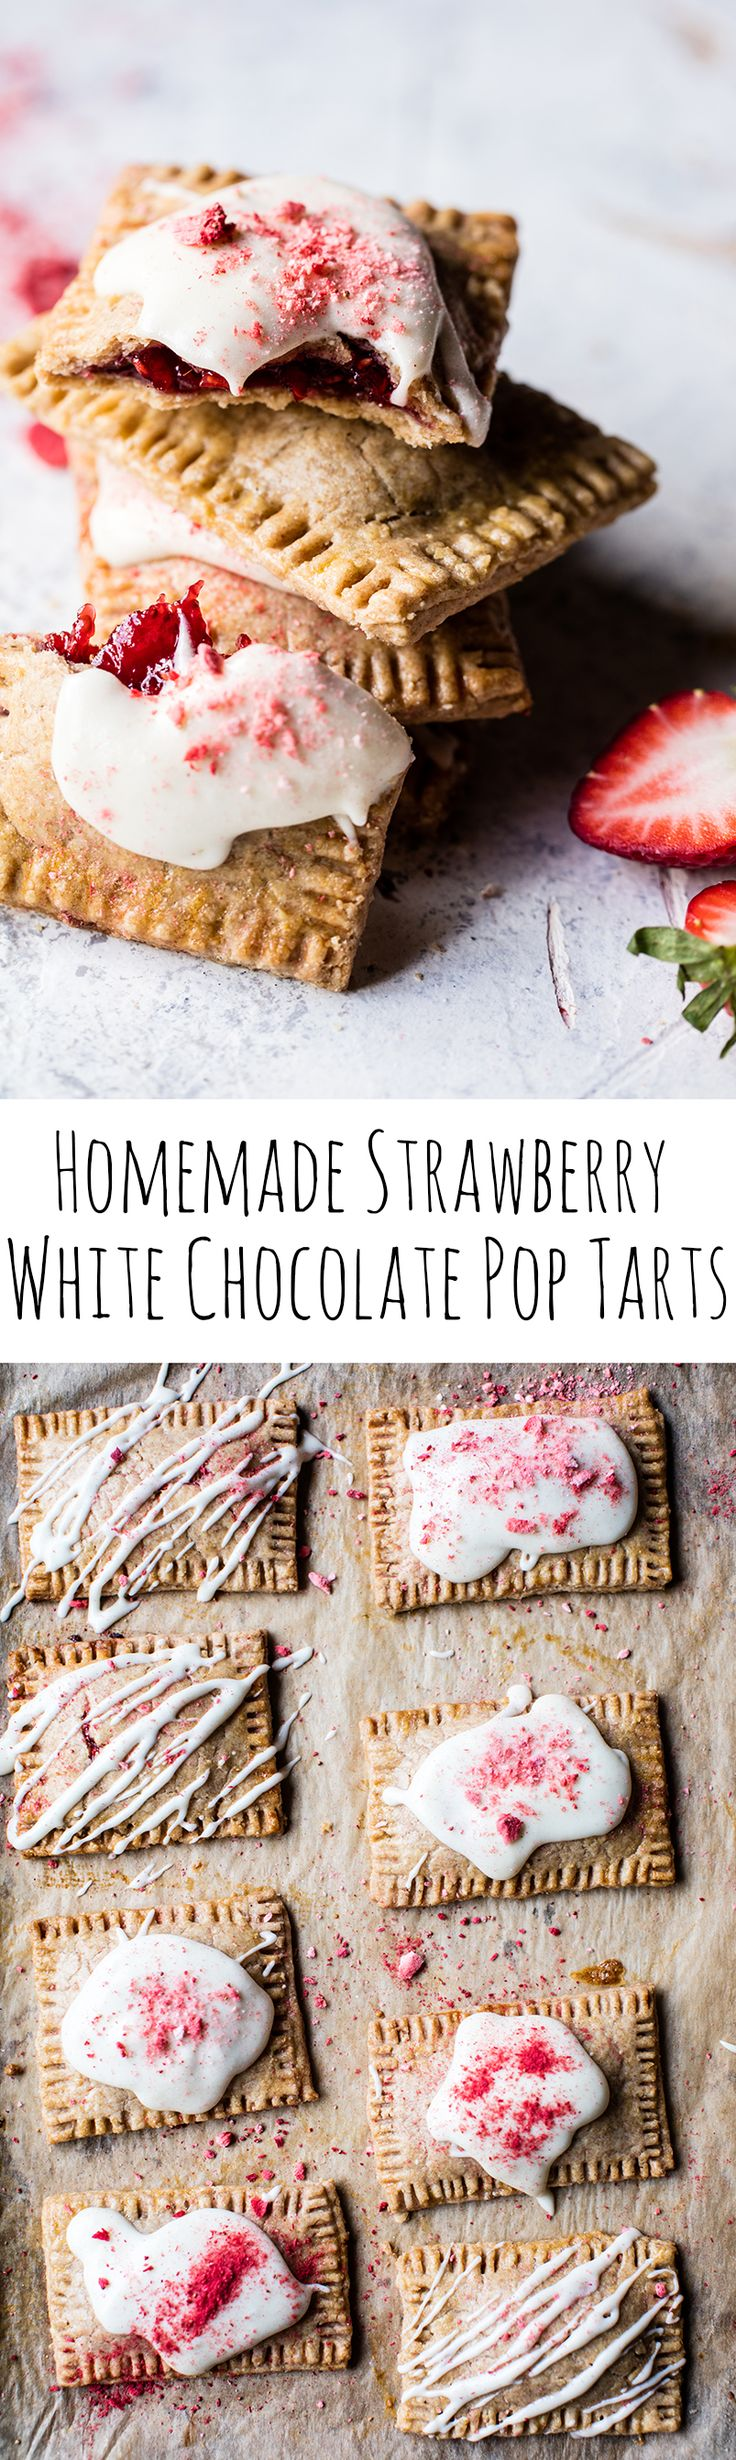 Homemade Strawberry White Chocolate Pop Tarts   halfbakedharvest.com @hbharvest